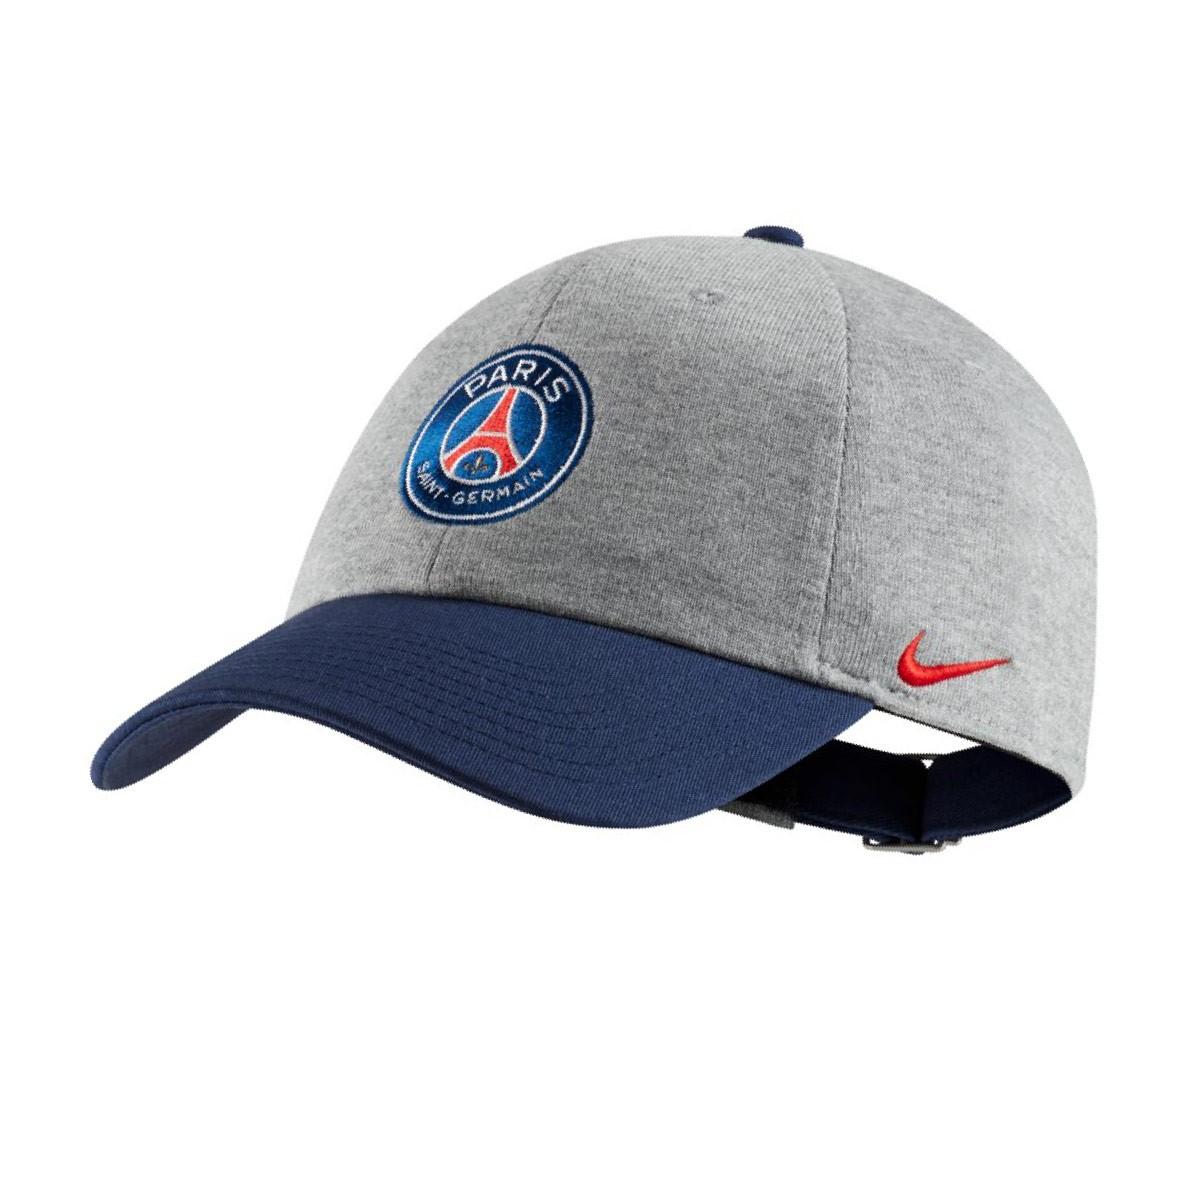 2055bf39c744f Boné Nike Paris Saint-Germain Heritage86 2018-2019 Crianças Dark  grey-Hrather-Challenge red - Loja de futebol Fútbol Emotion